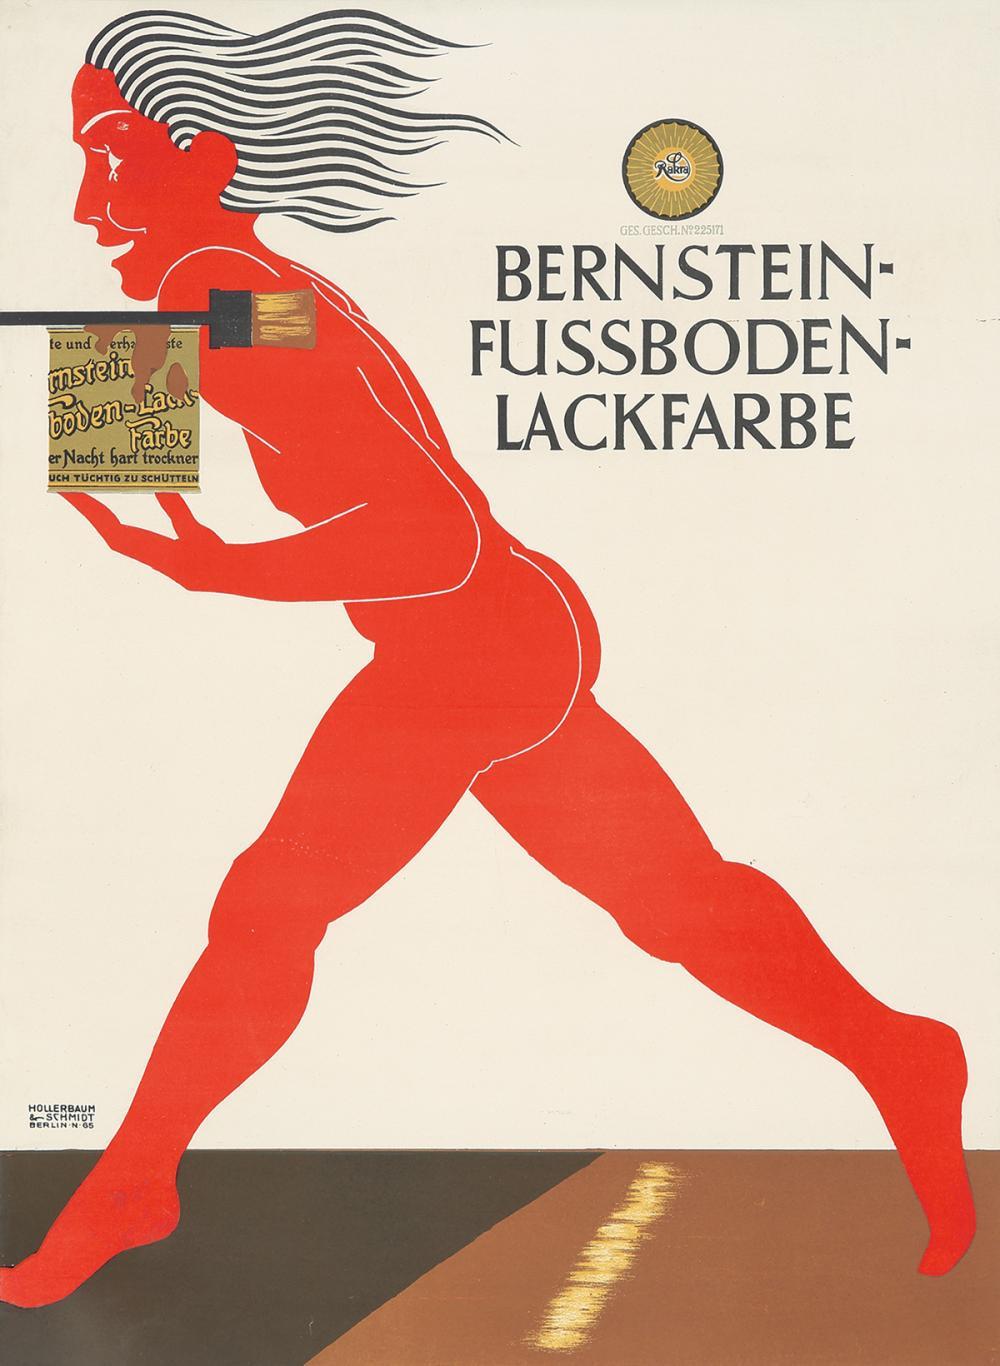 Bernstein-Fussboden-Lackfarbe.